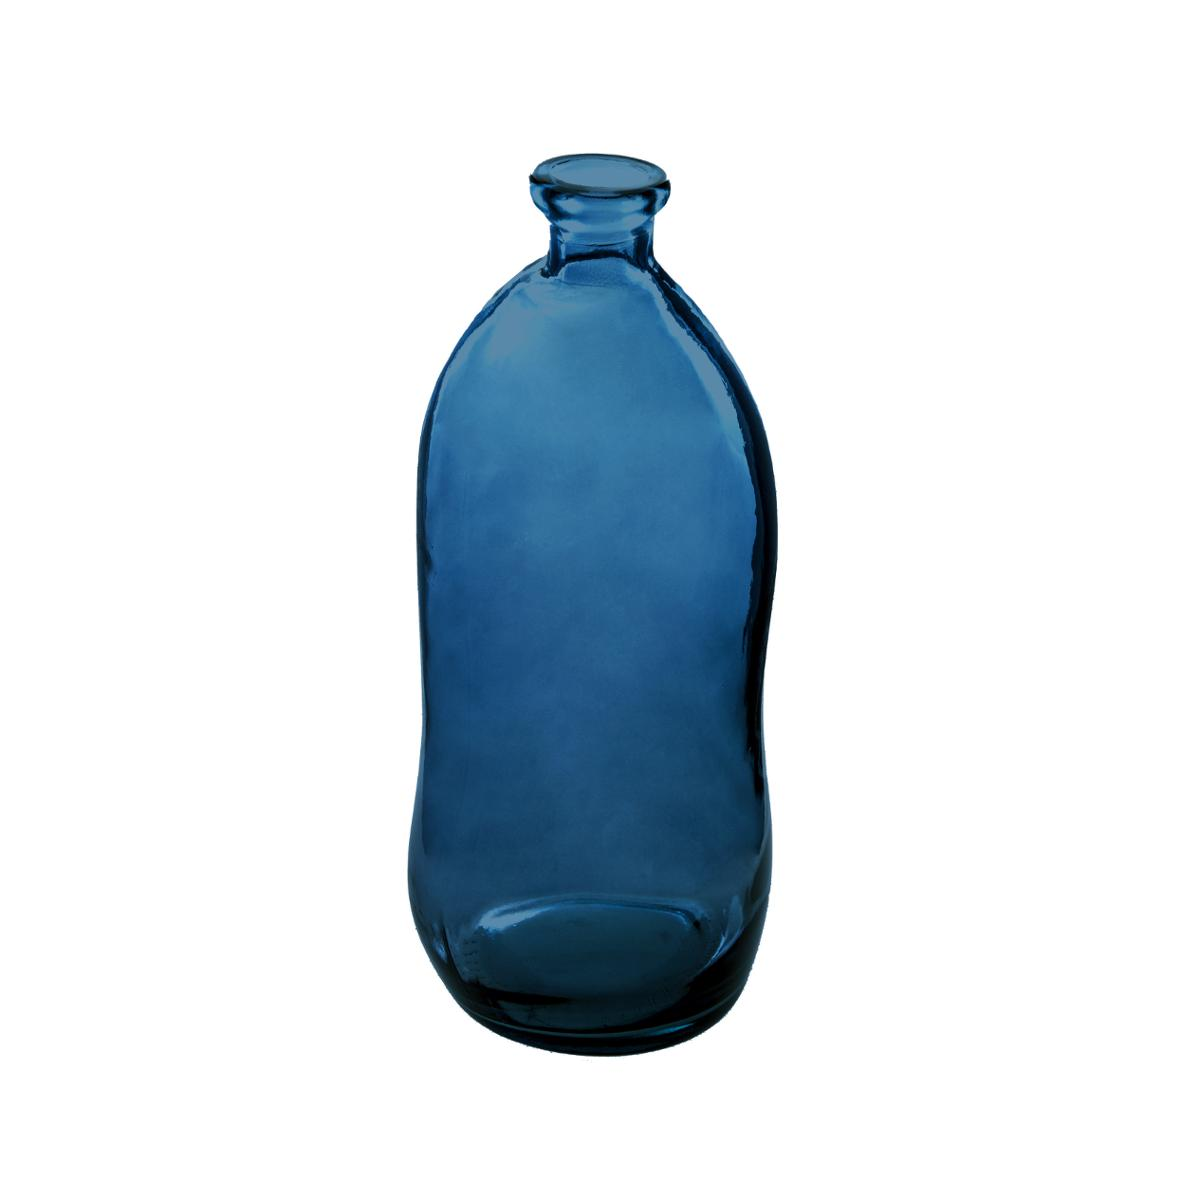 Vase bouteille verre recyclé H 51 - Atmosphera